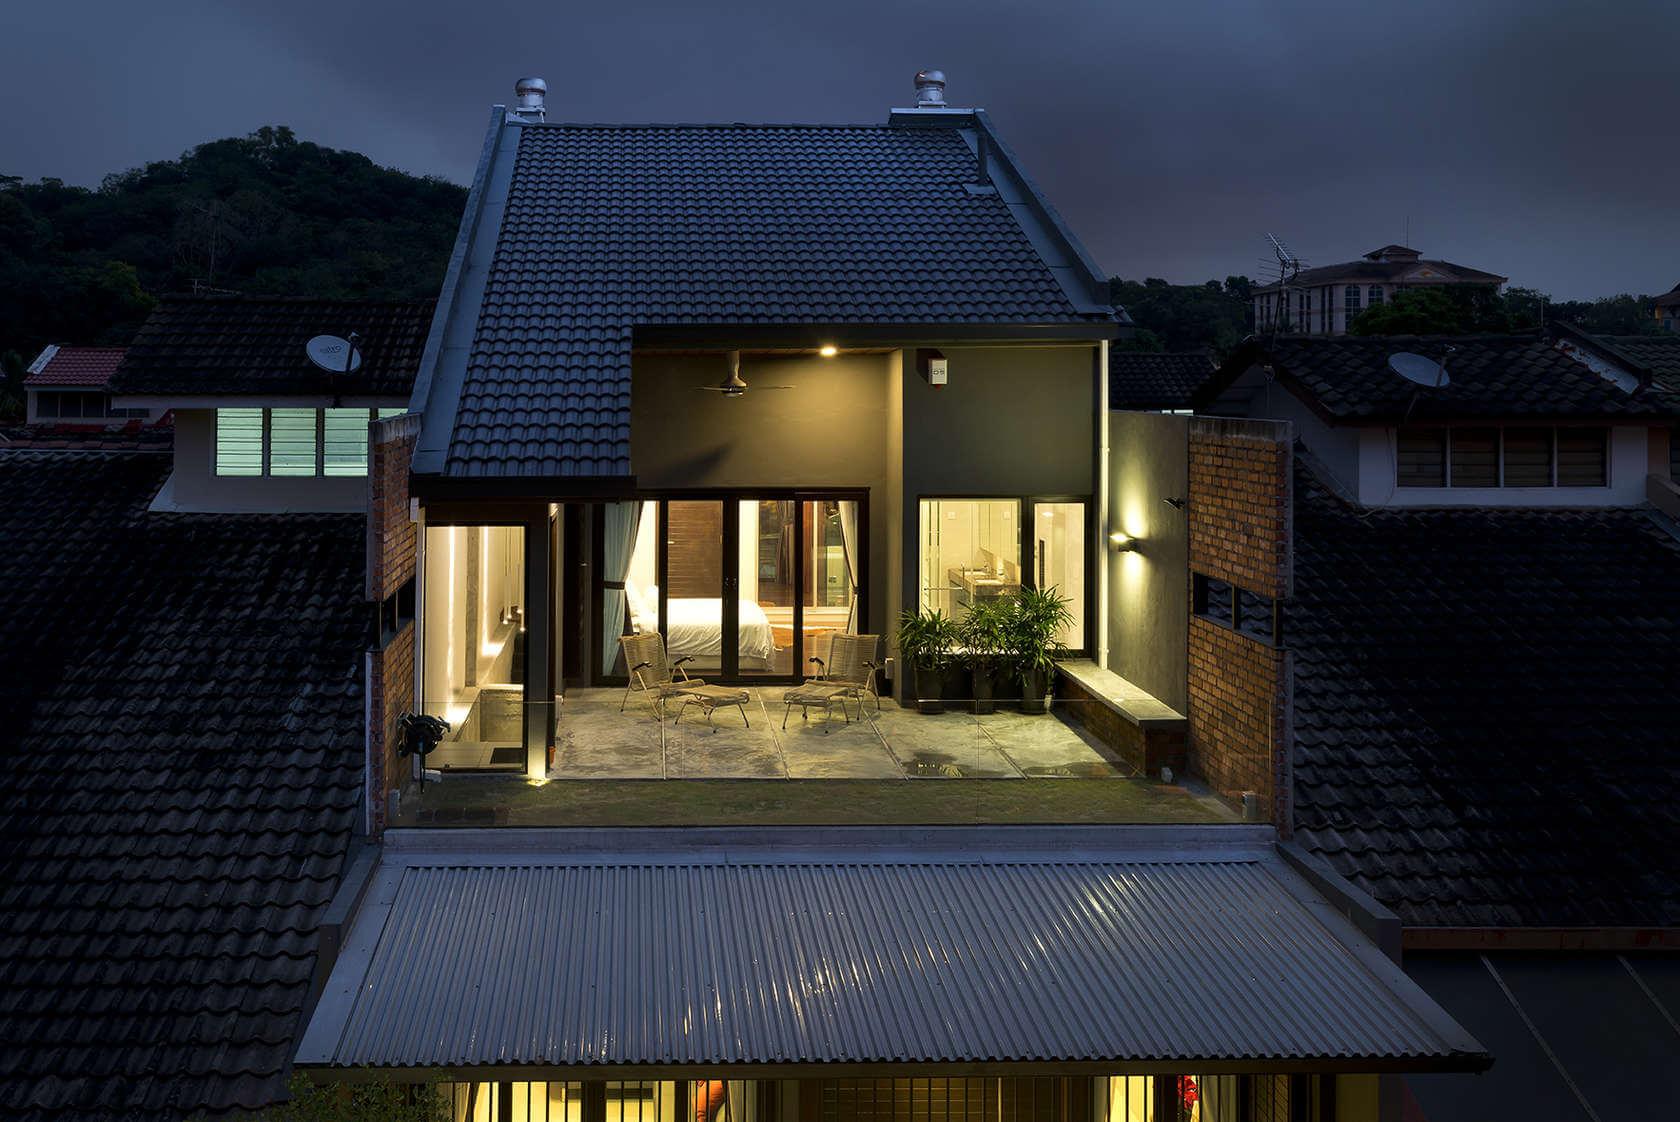 kuala-lumpur-home-drtan-lm-architect-02